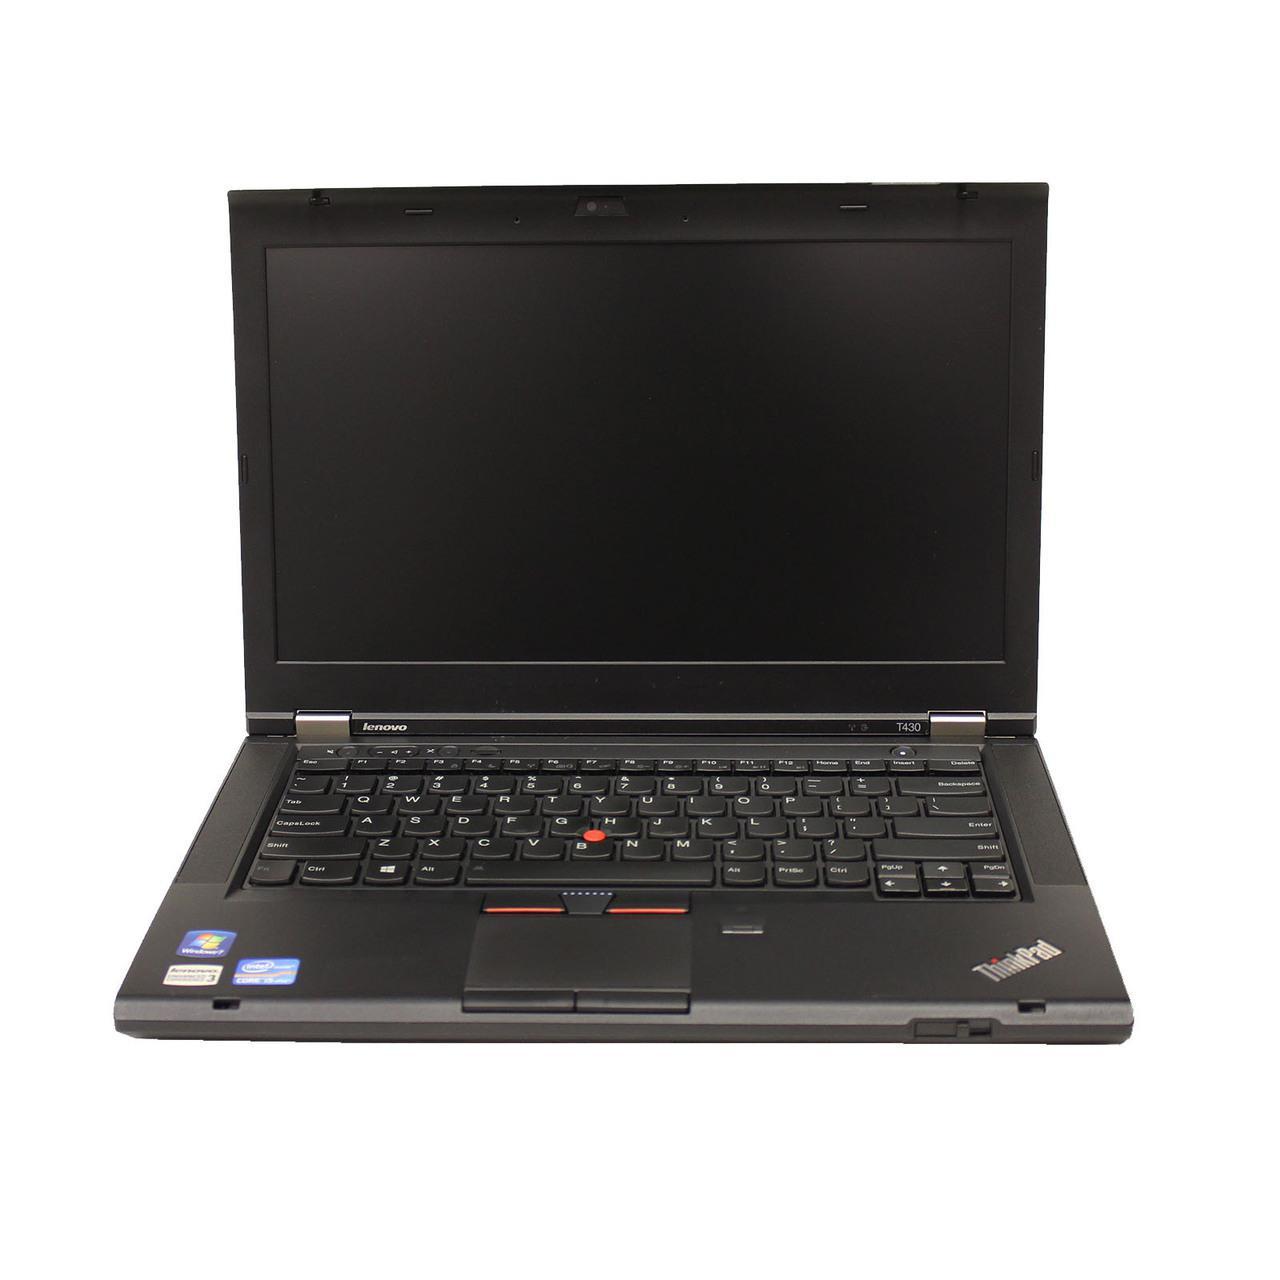 Lenovo ThinkPad T430 14-inch (February 2011) - Core i7-3520M - 16 GB  - SSD 512 GB